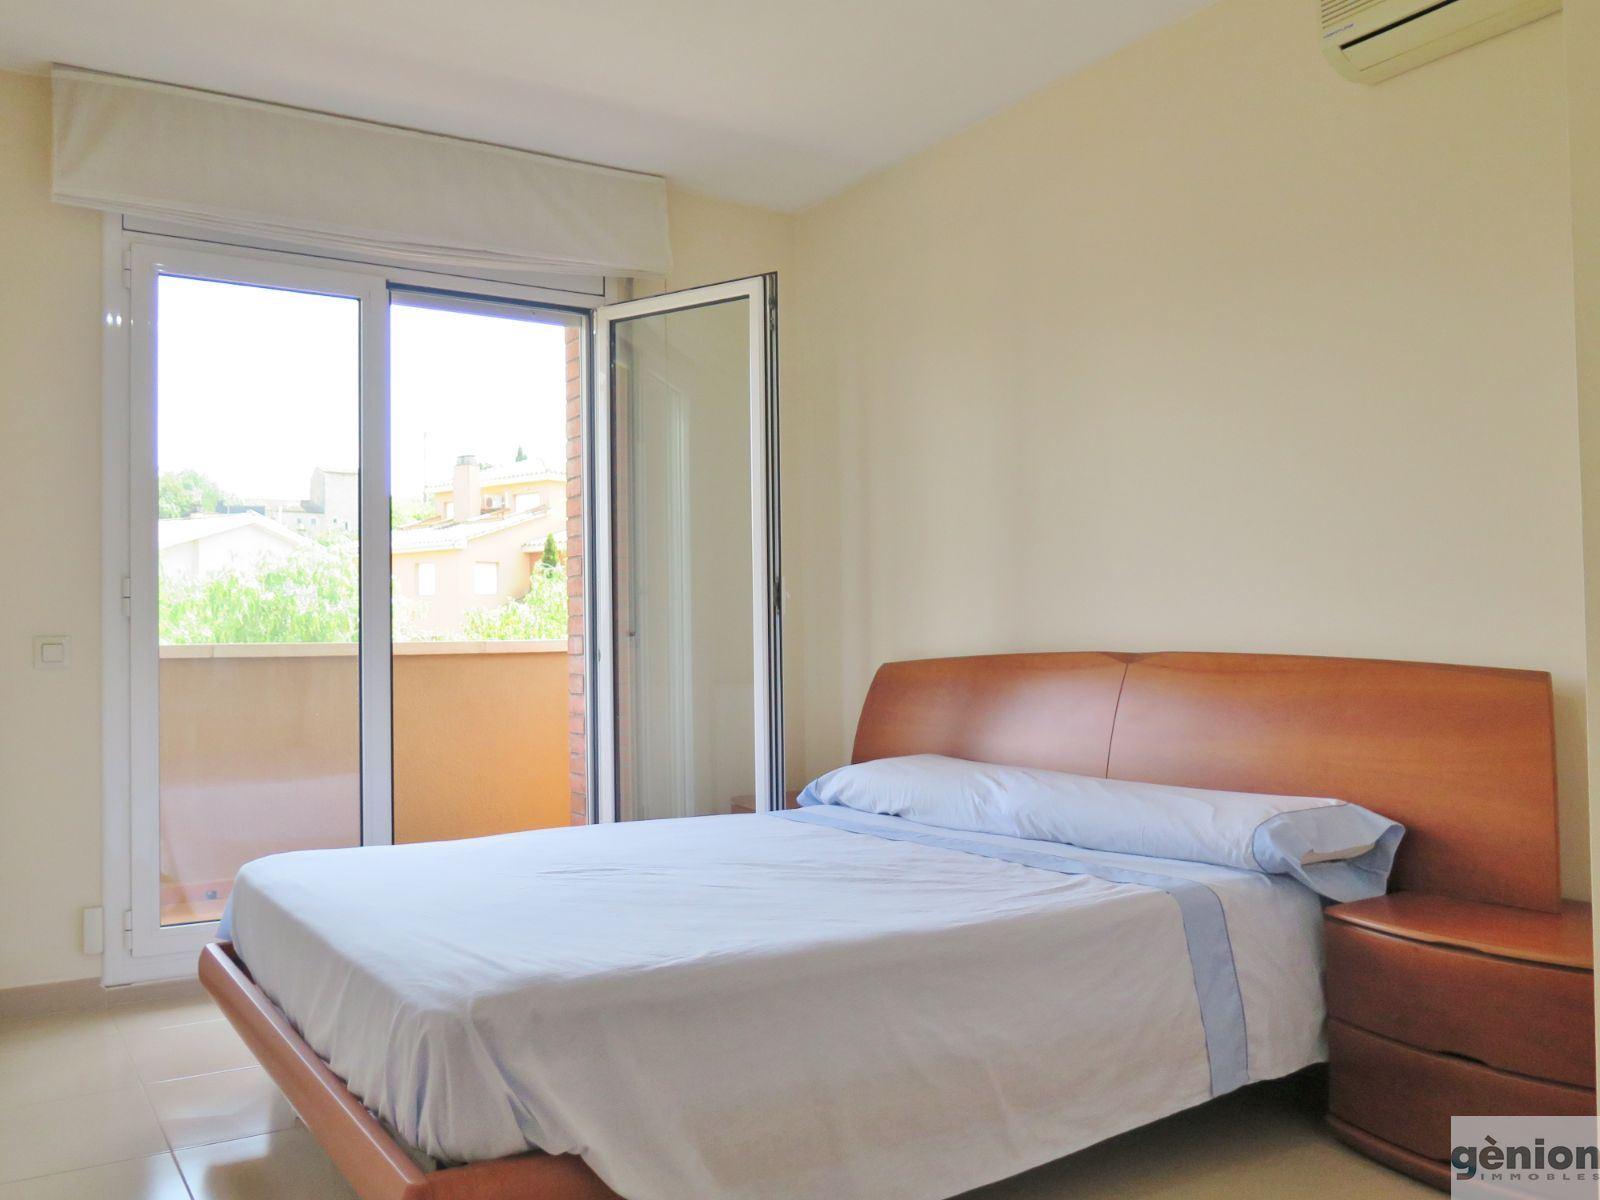 CASA APAREADA EN PALAU, GIRONA. 420M² DE PARCELA Y 238M² CONSTRUIDOS